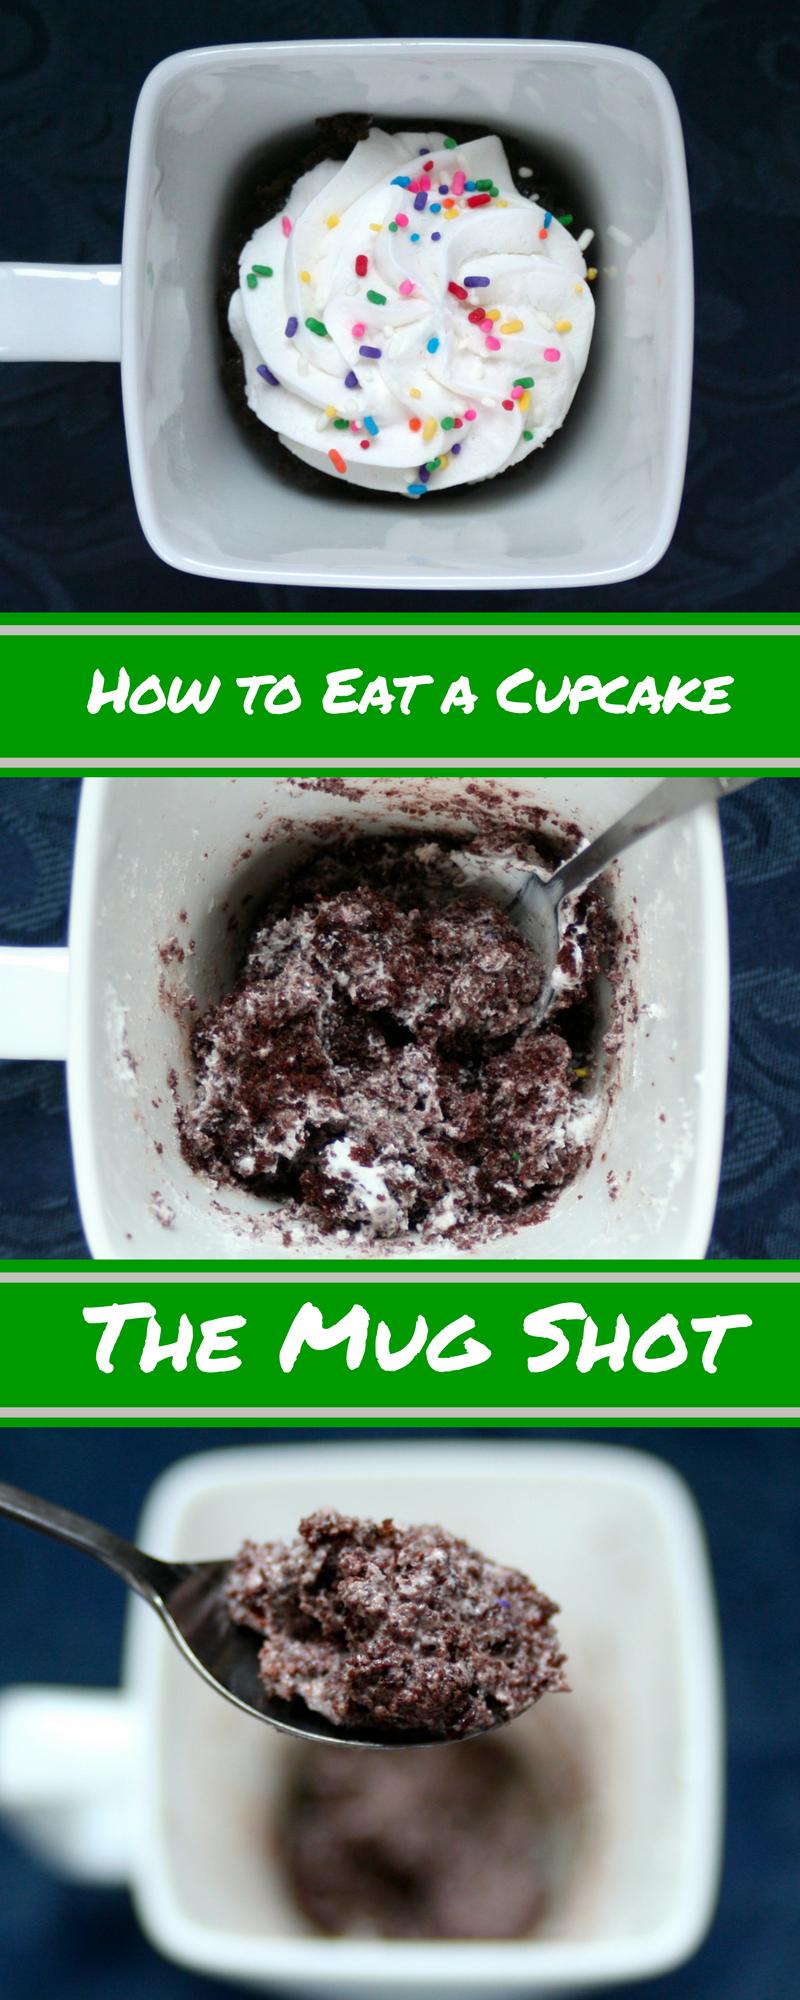 How to Eat a Cupcake - the Mug Shot.png